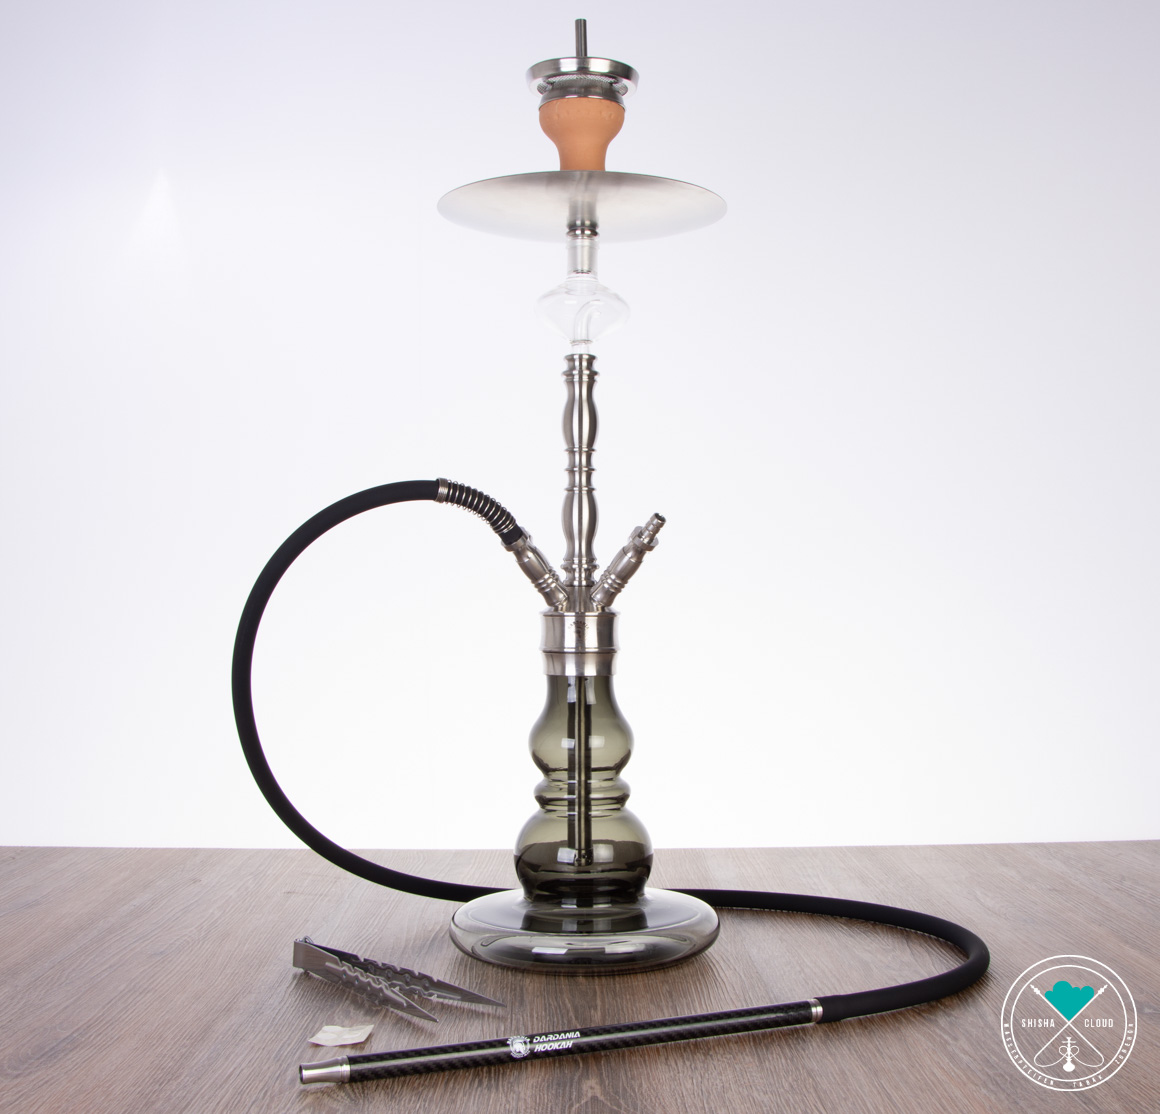 dardania top qualit t shisha kaufen shisha cloud. Black Bedroom Furniture Sets. Home Design Ideas